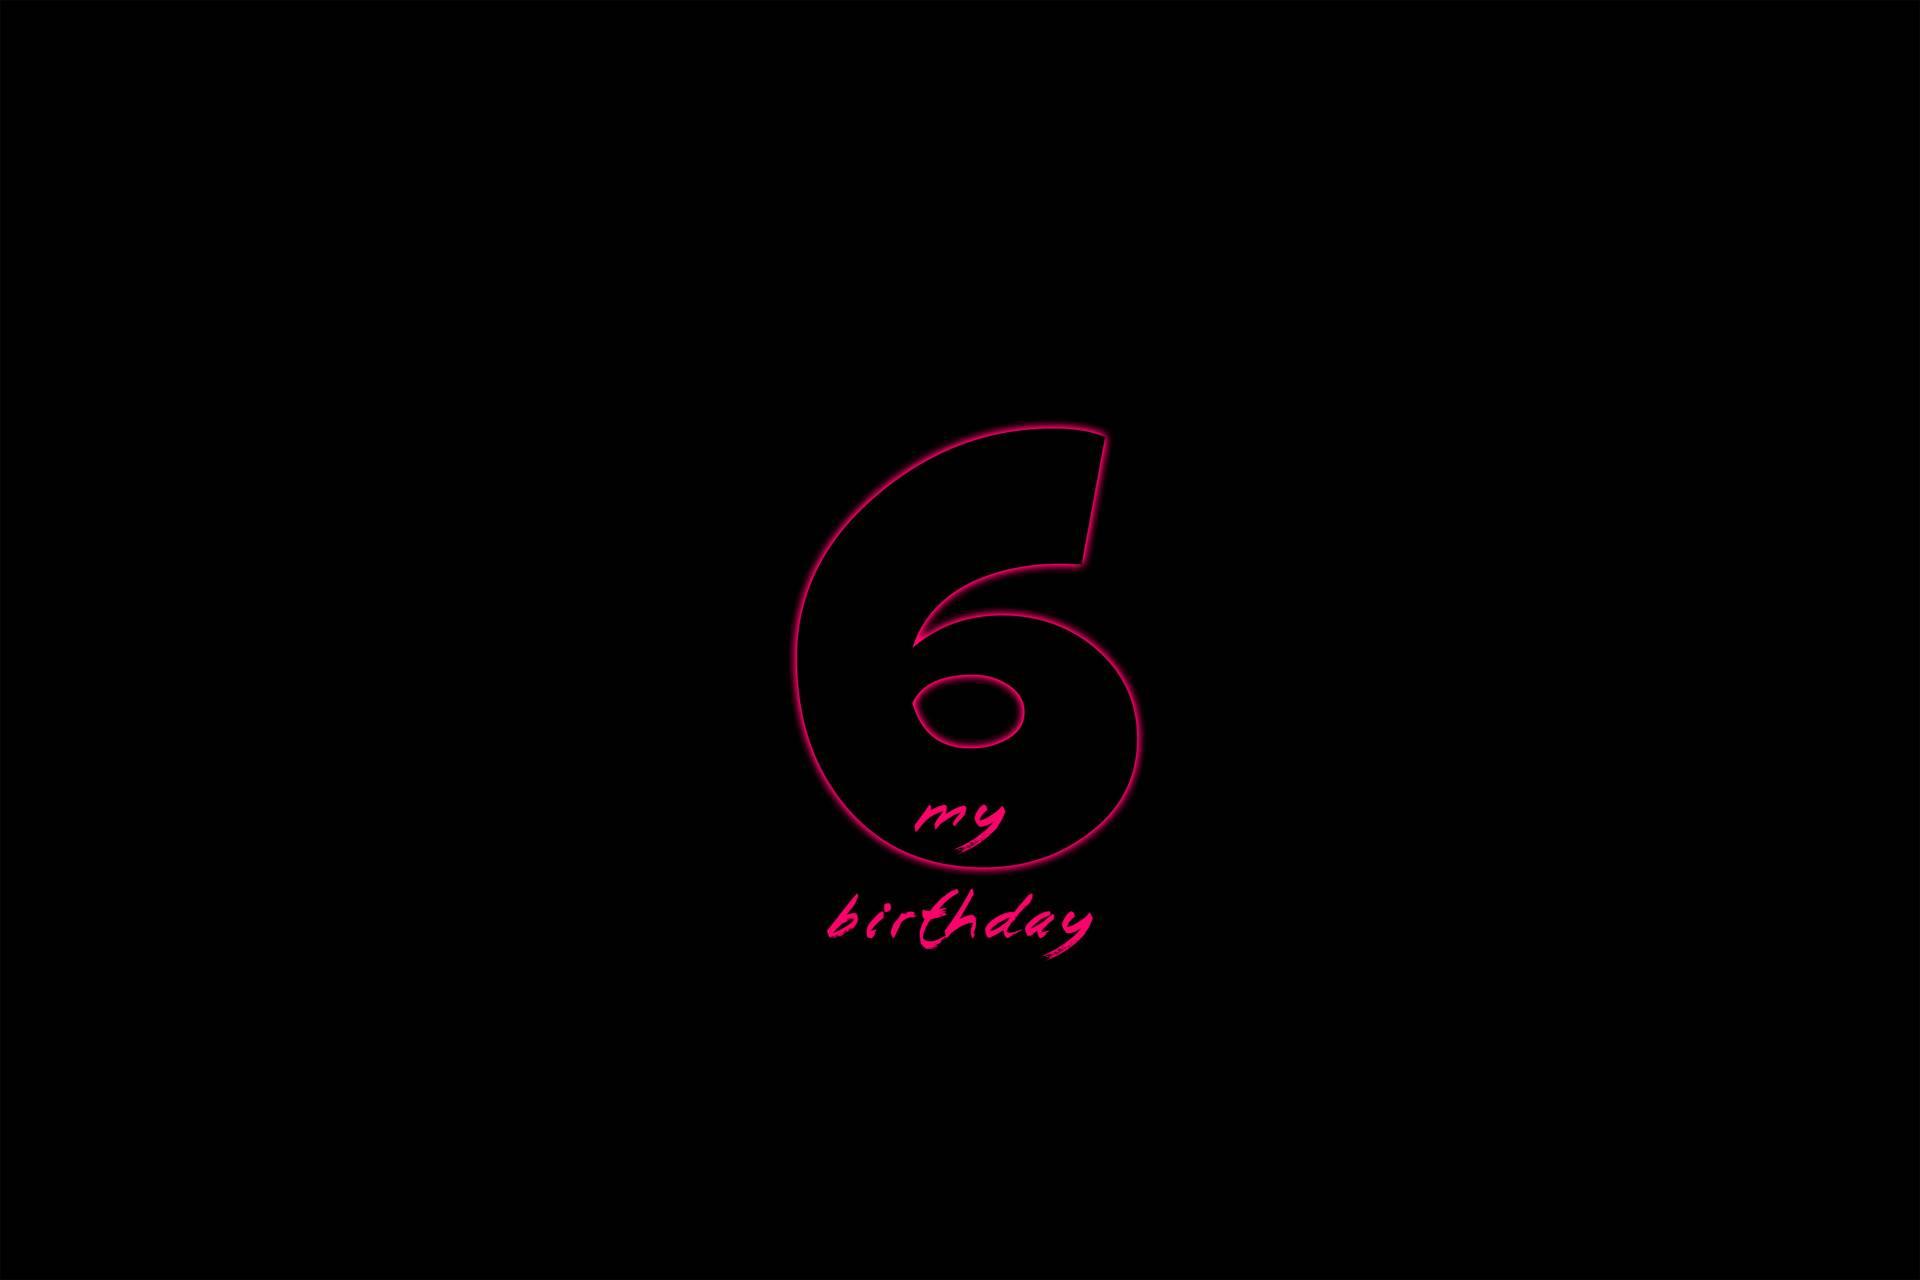 Birthday 6